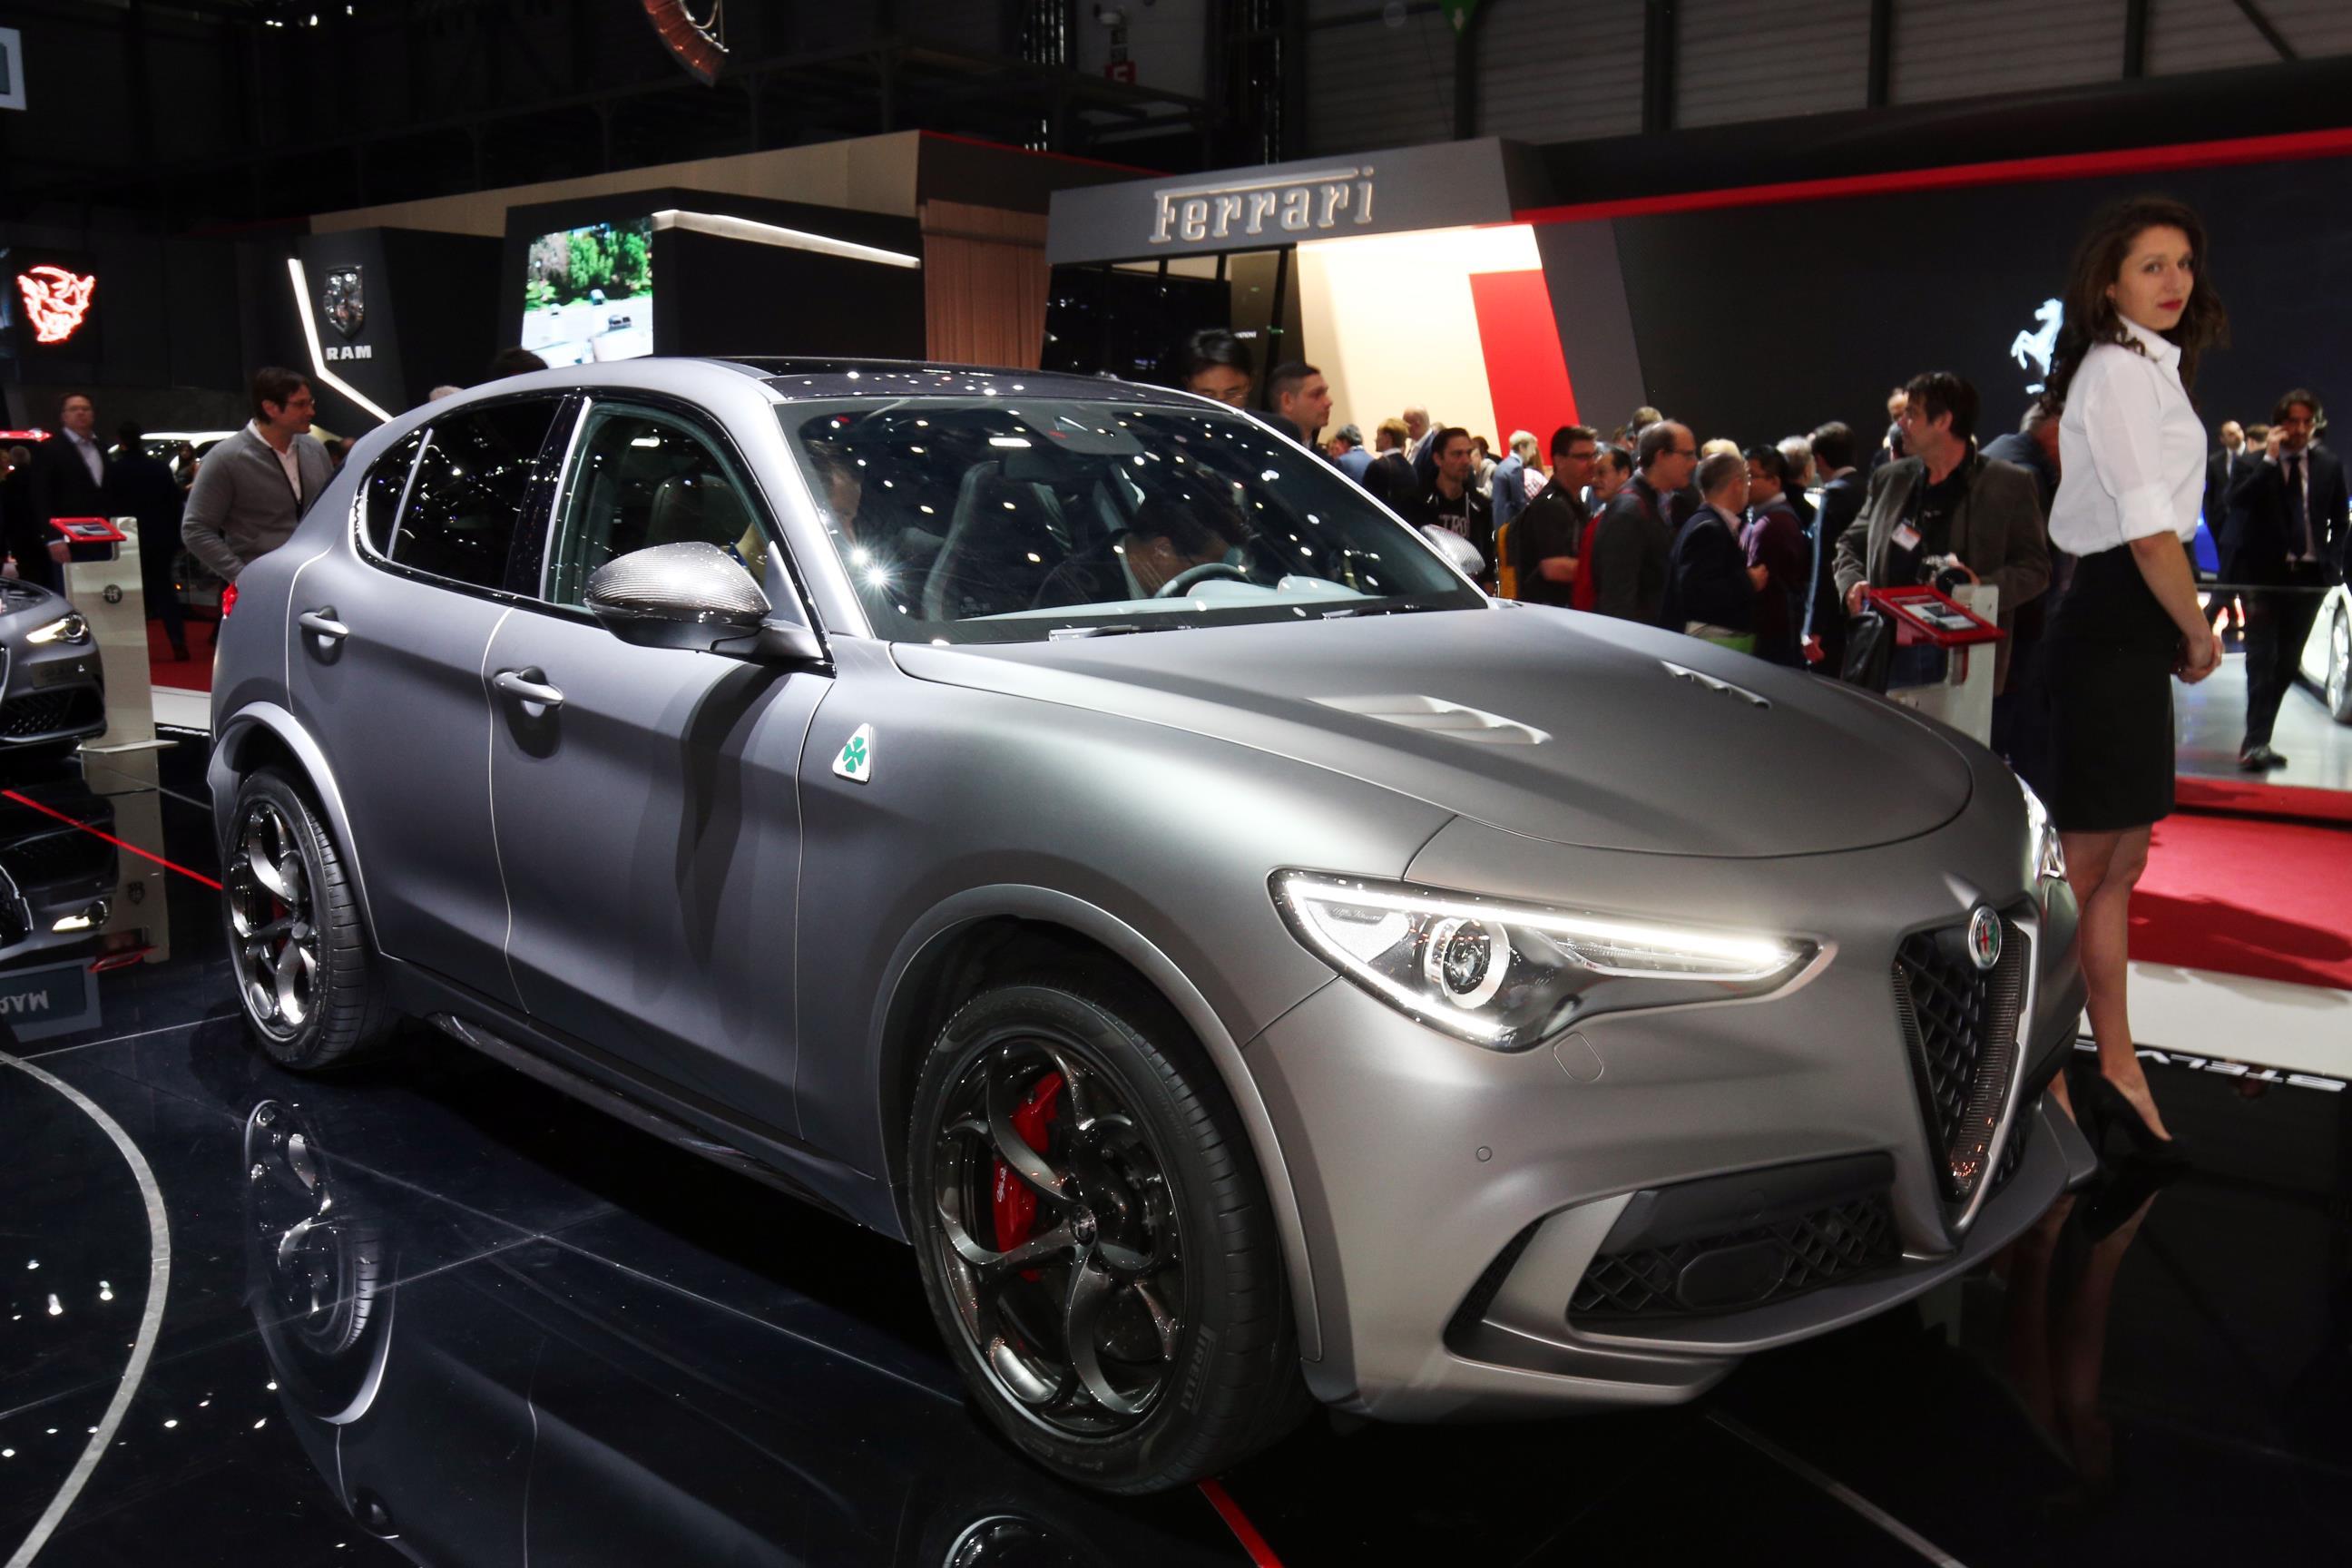 Geneva Motor Show 2018 Mega Gallery Part 1 (2)